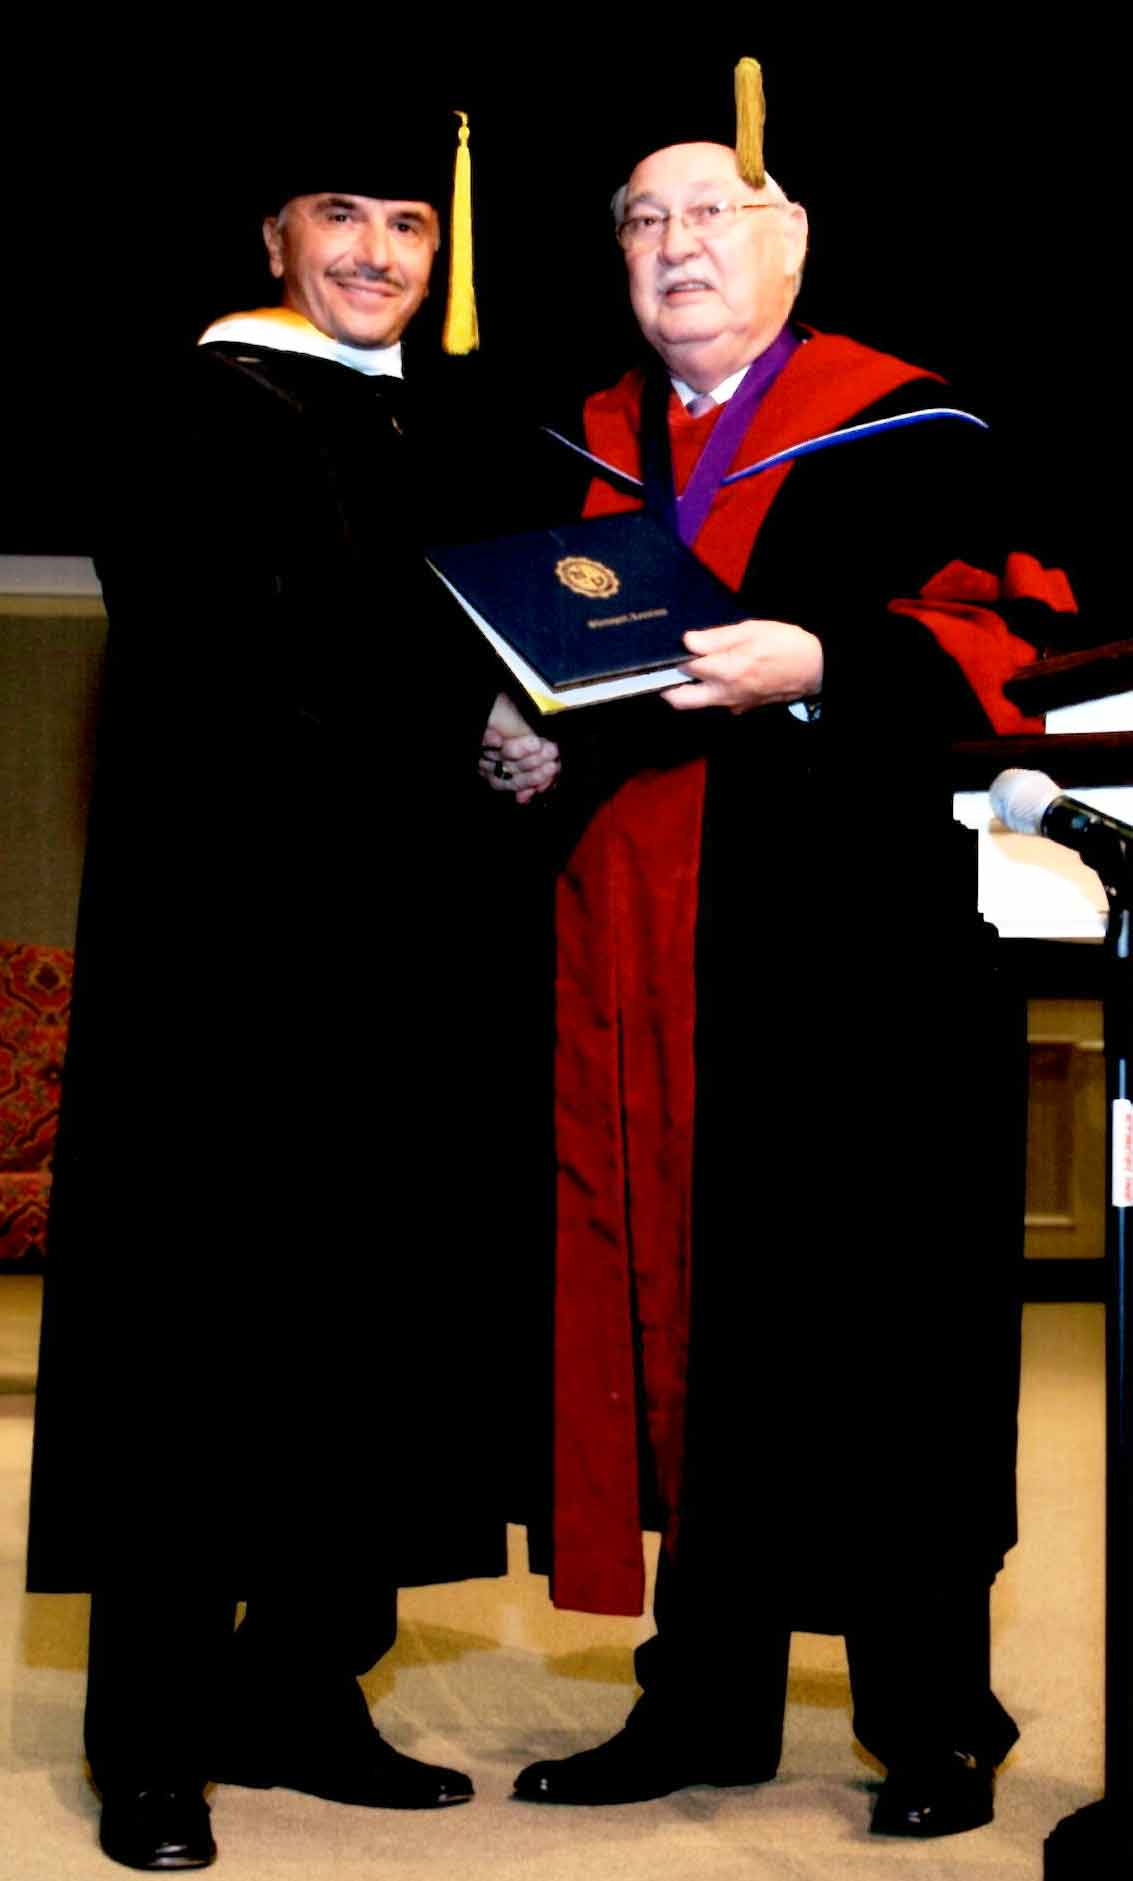 Ehrendoktowürde Dr. Leonard Coldwell der Luisianna Baptist University © 2002-2018 Dr. Leonard Coldwell